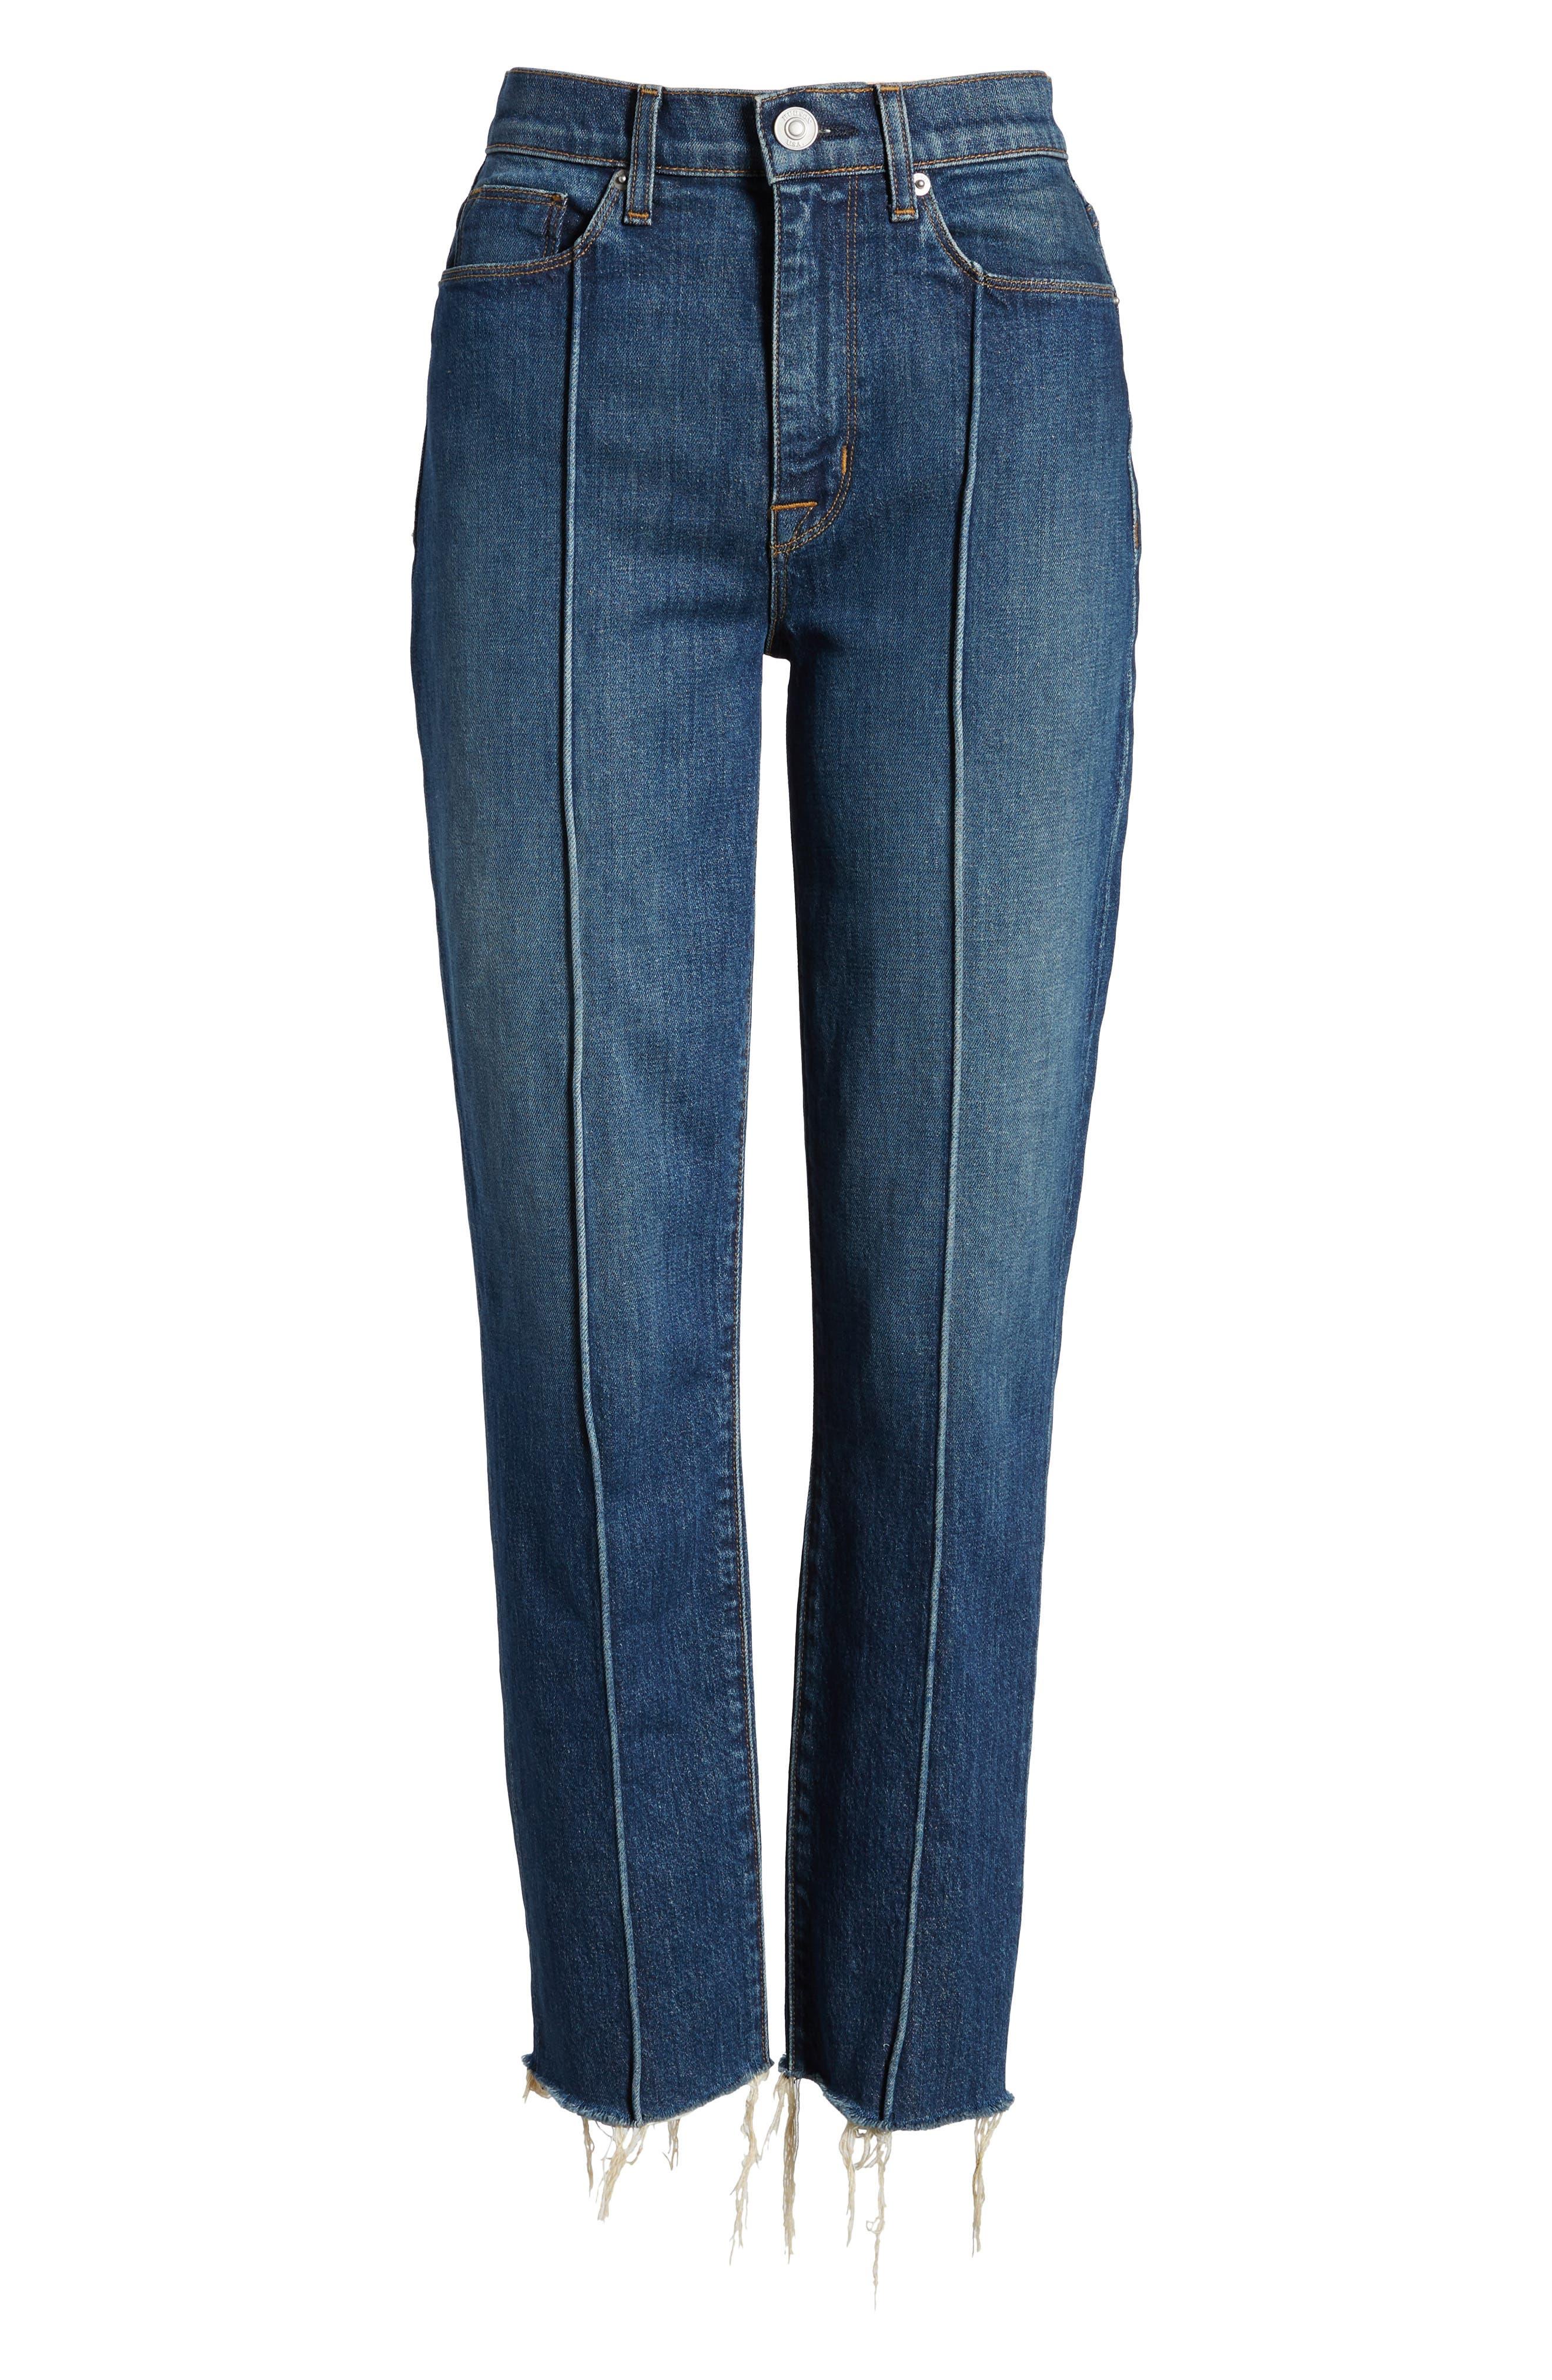 Zoeey High Waist Crop Straight Leg Jeans,                             Alternate thumbnail 7, color,                             402